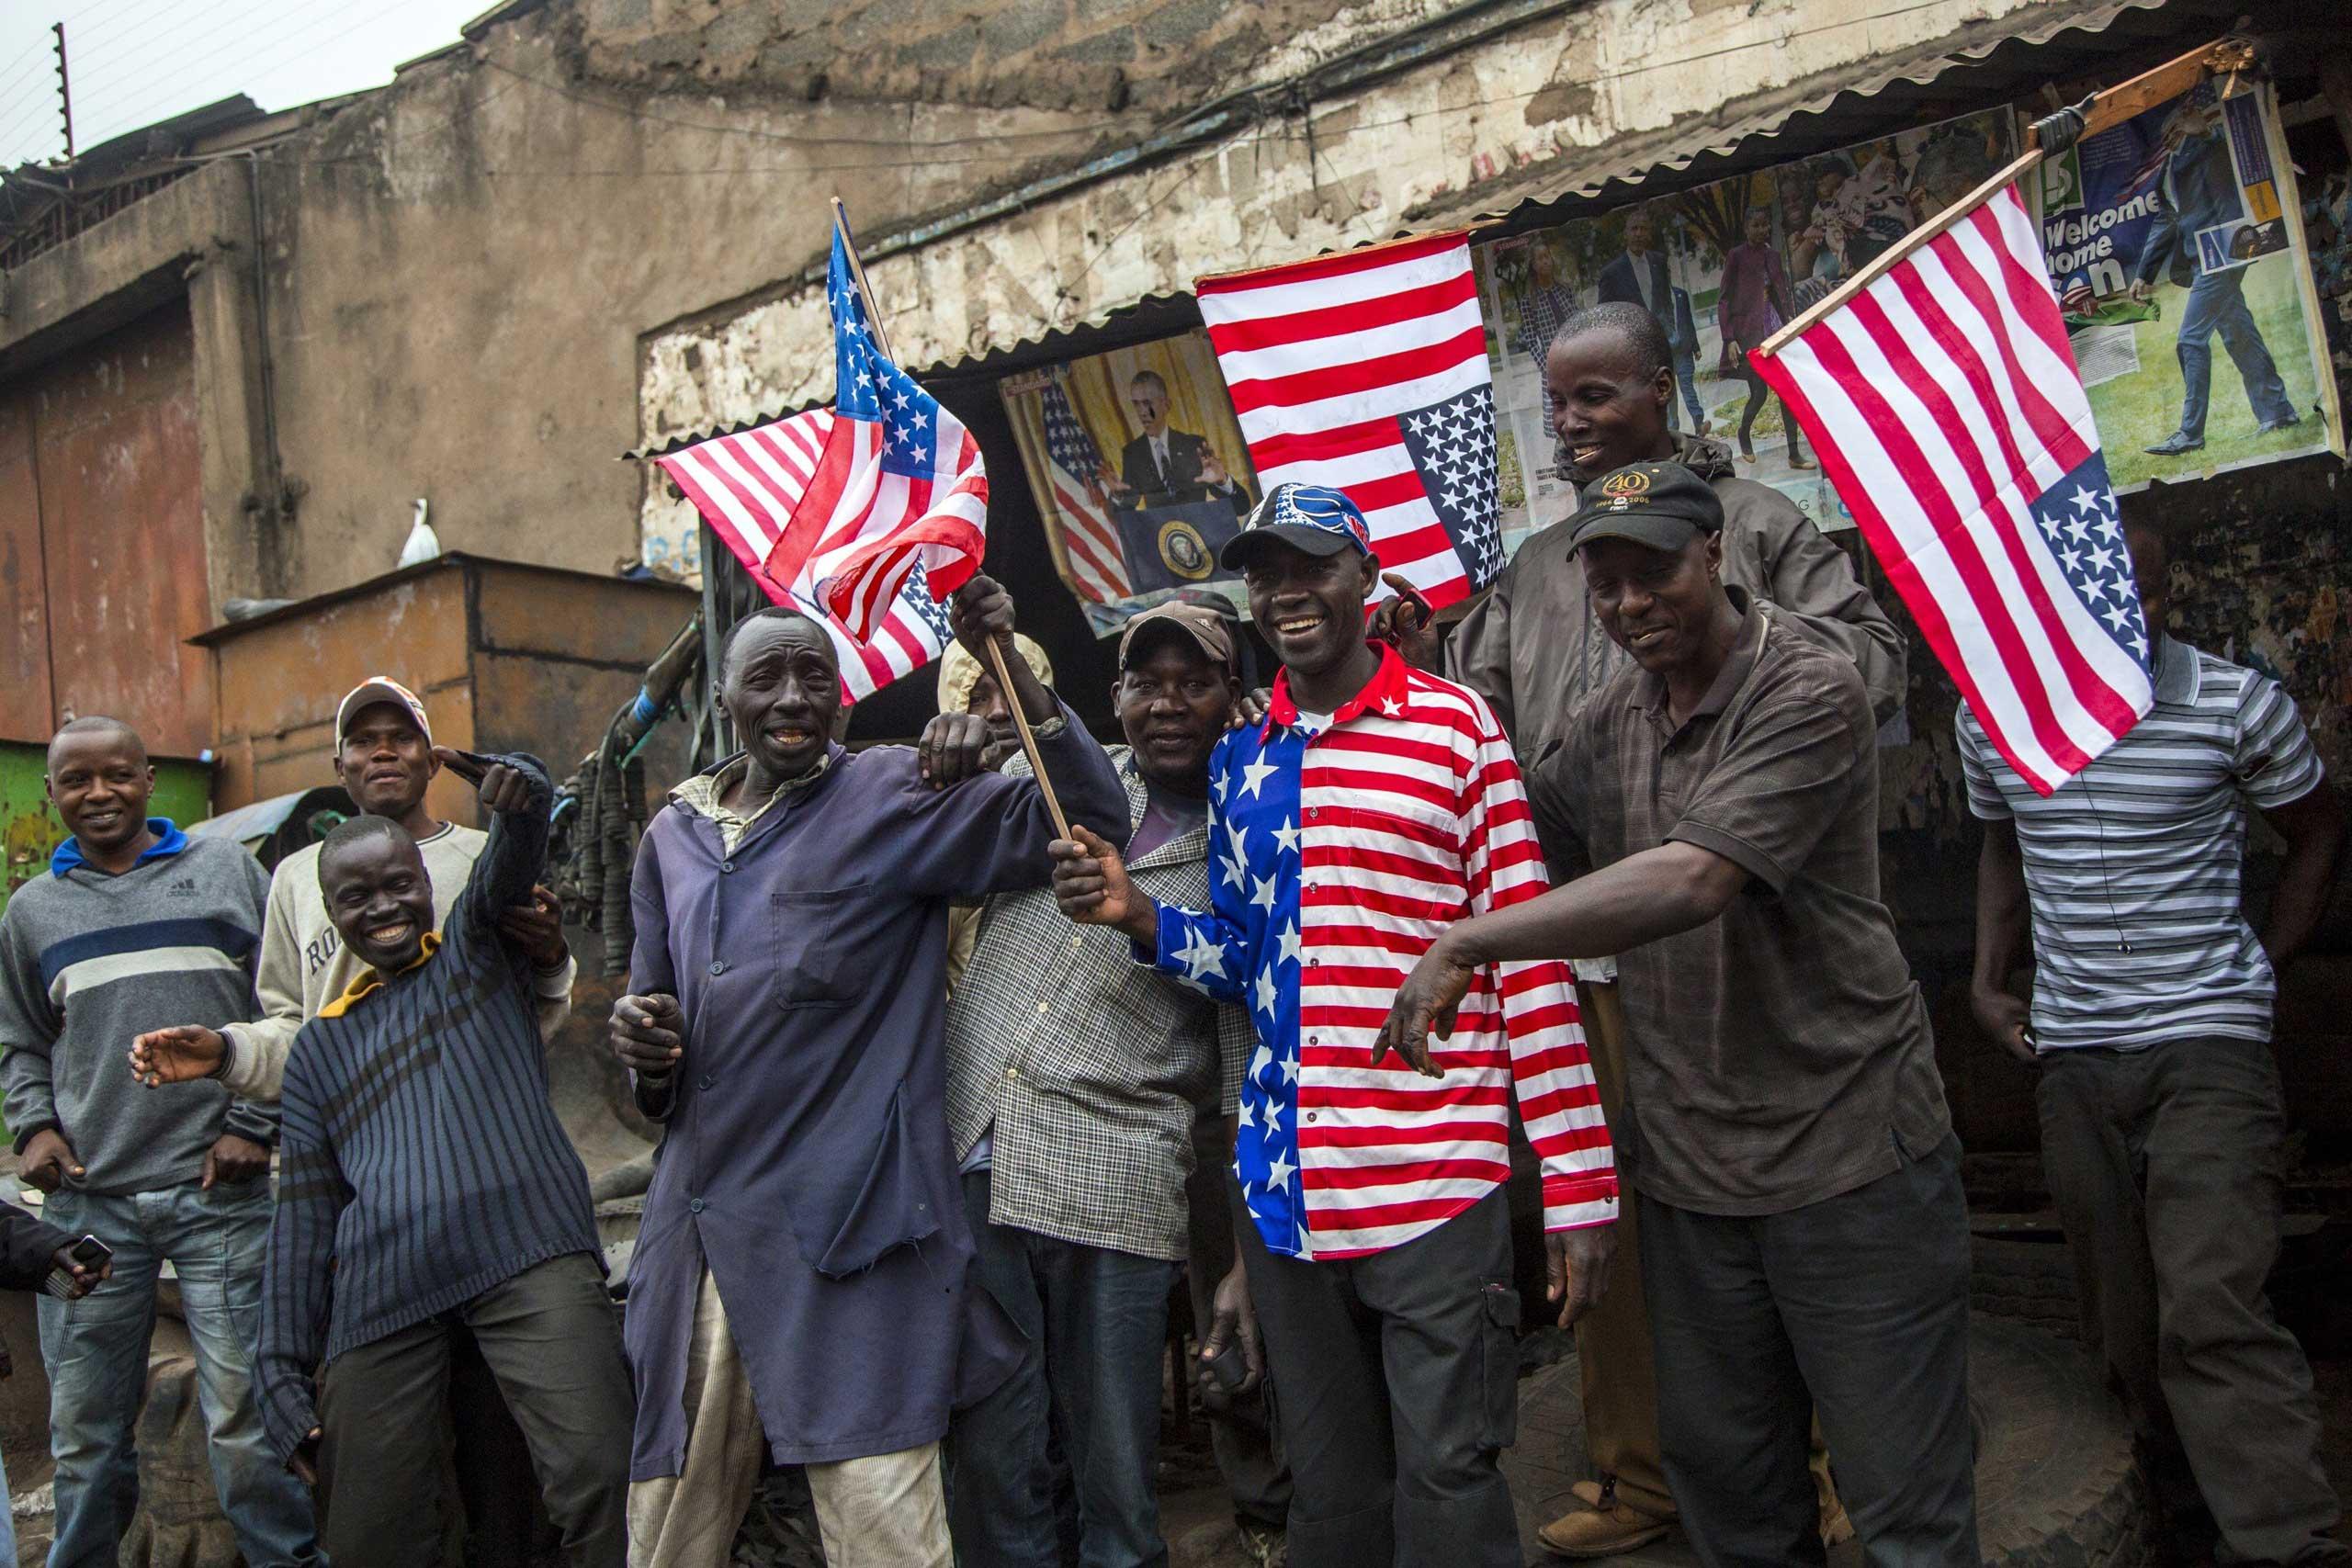 People wave U.S. flags before President Barack Obama's motorcade arrival, in Nairobi on July 25, 2015.